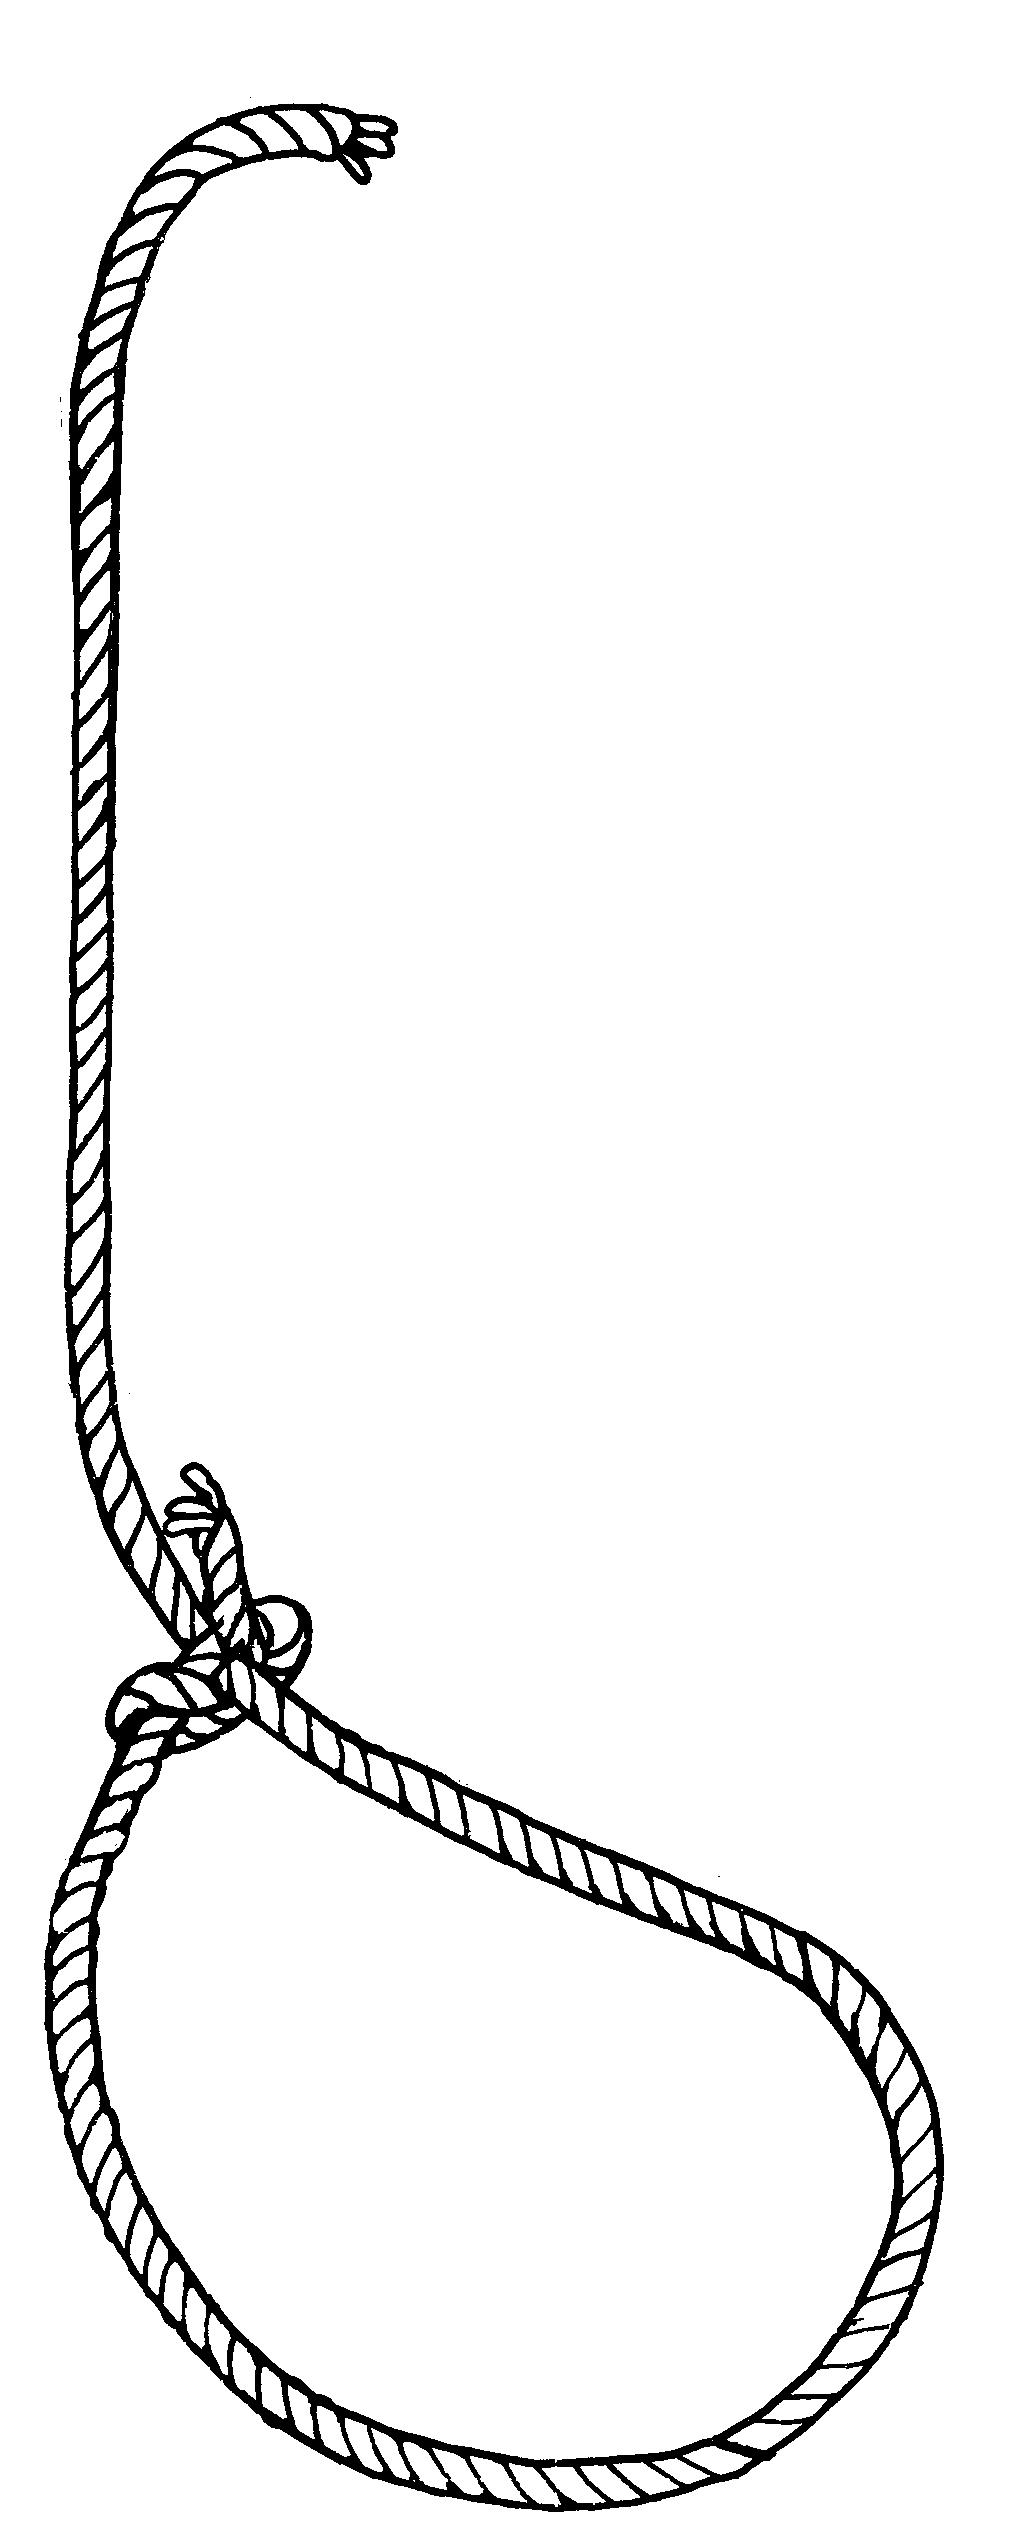 Lasso Knot Clipart.